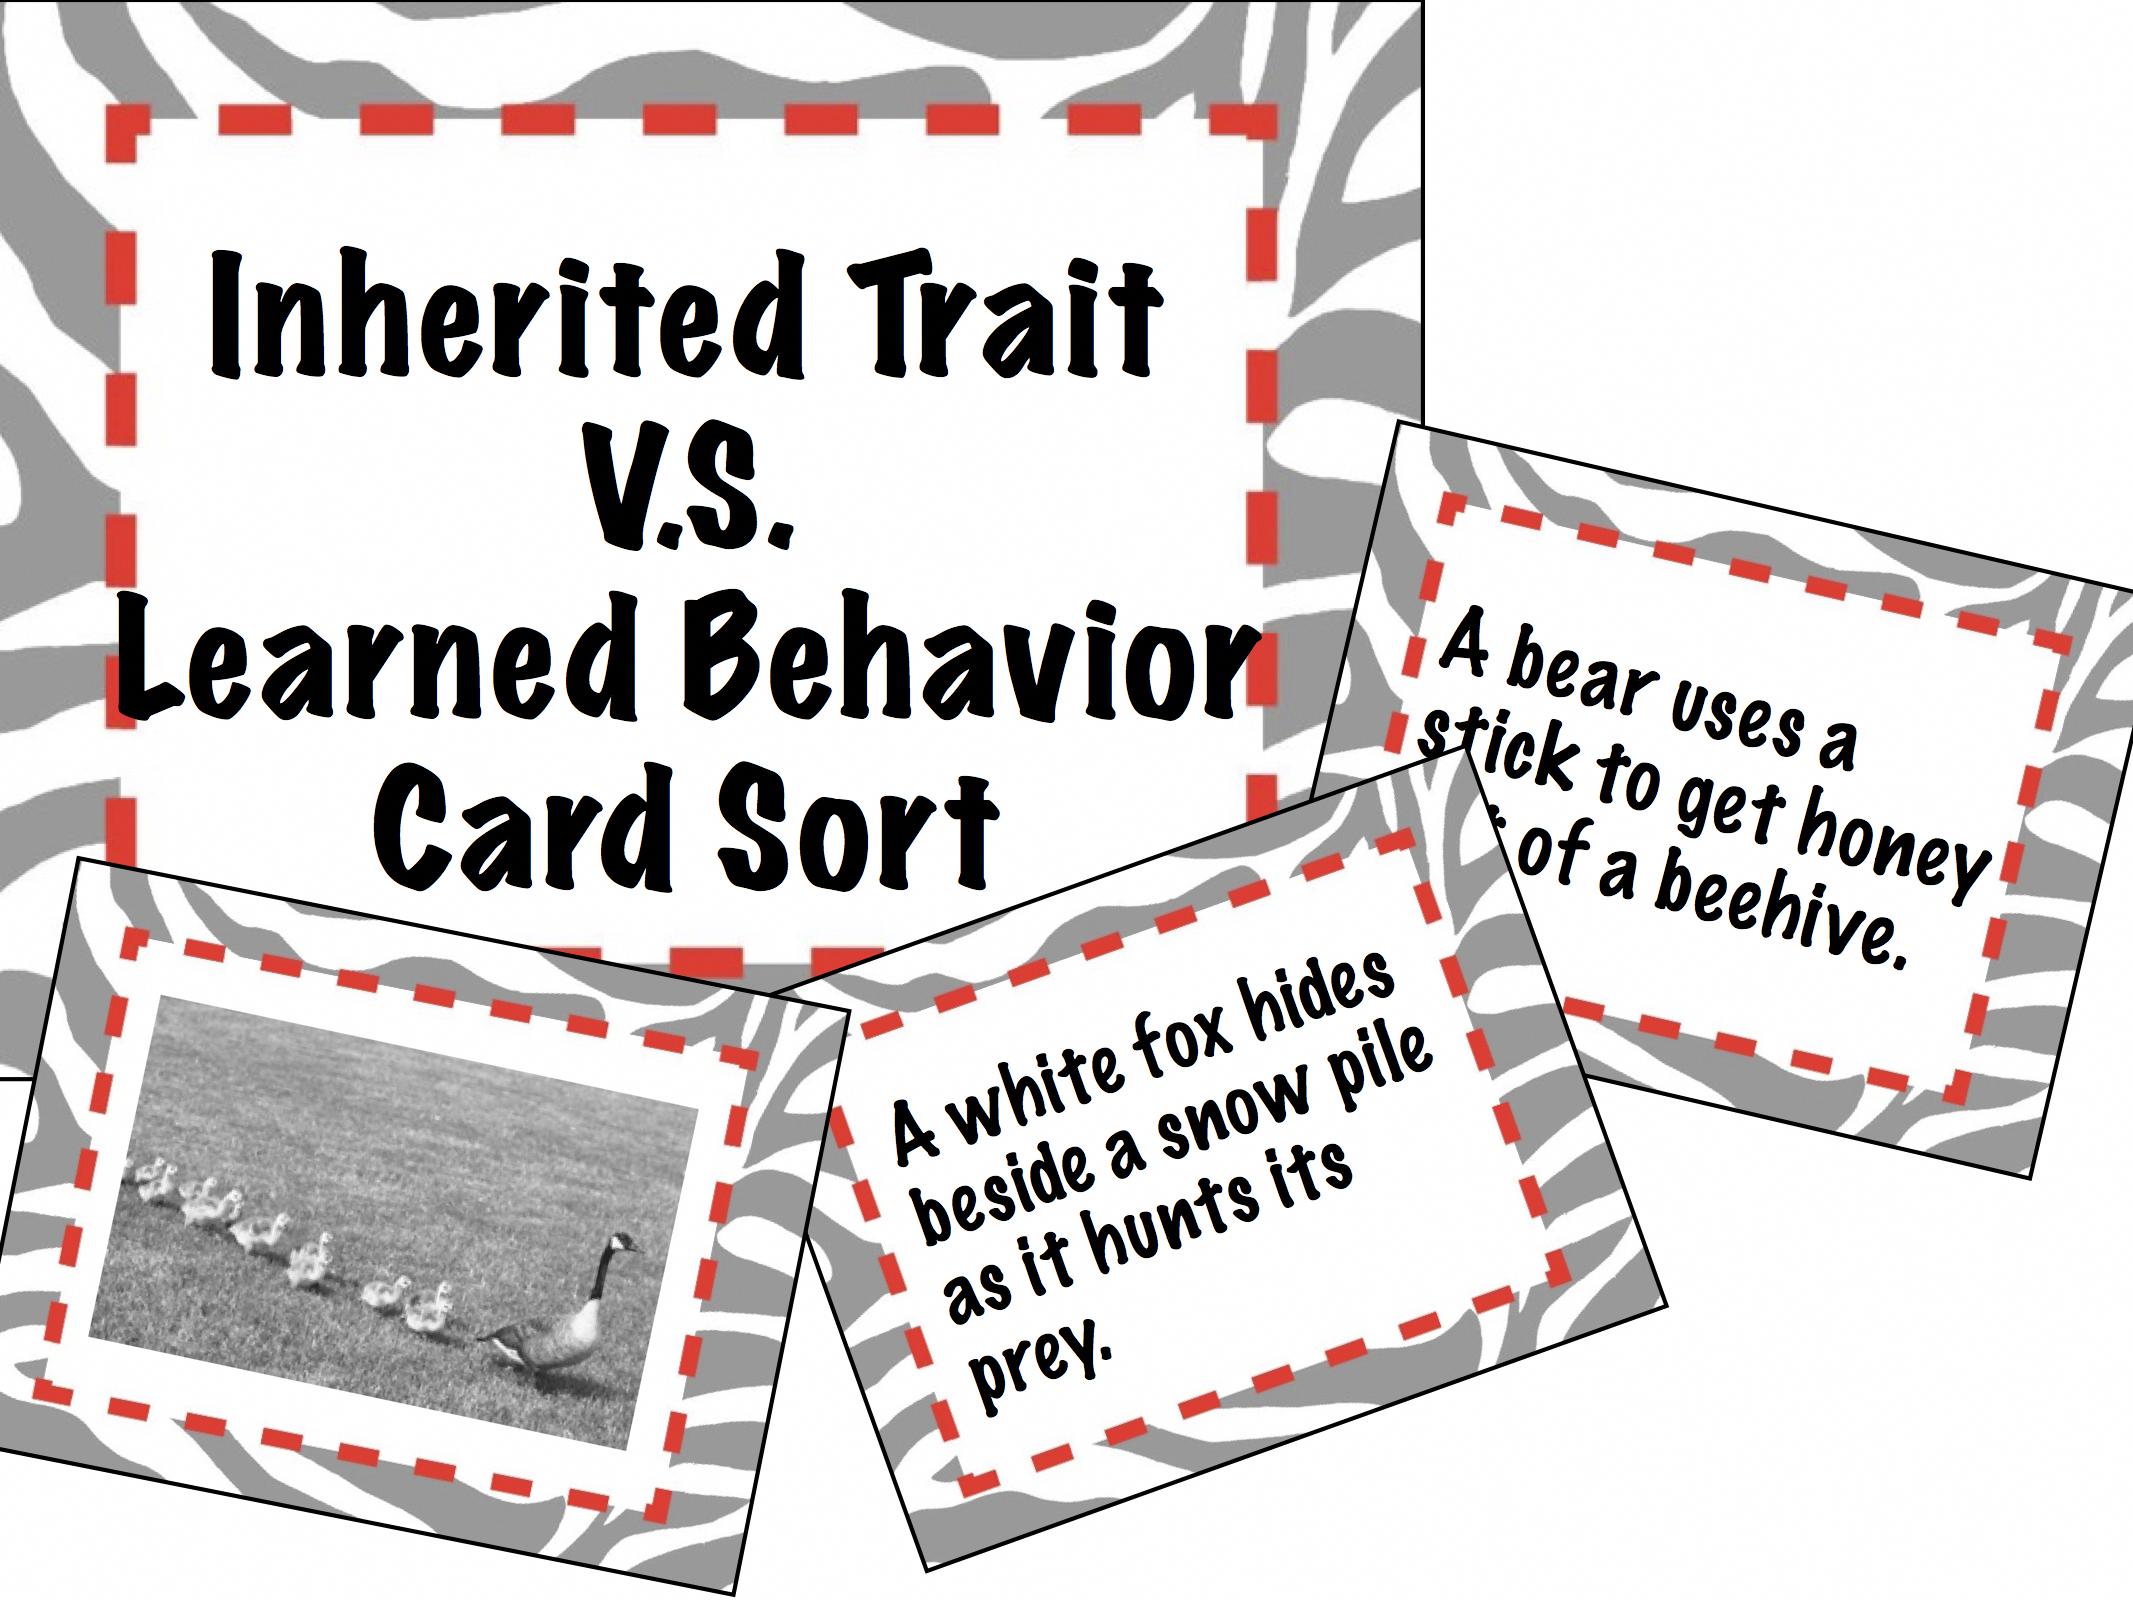 Inherited Trait Vs Learned Behavior Card Sort By